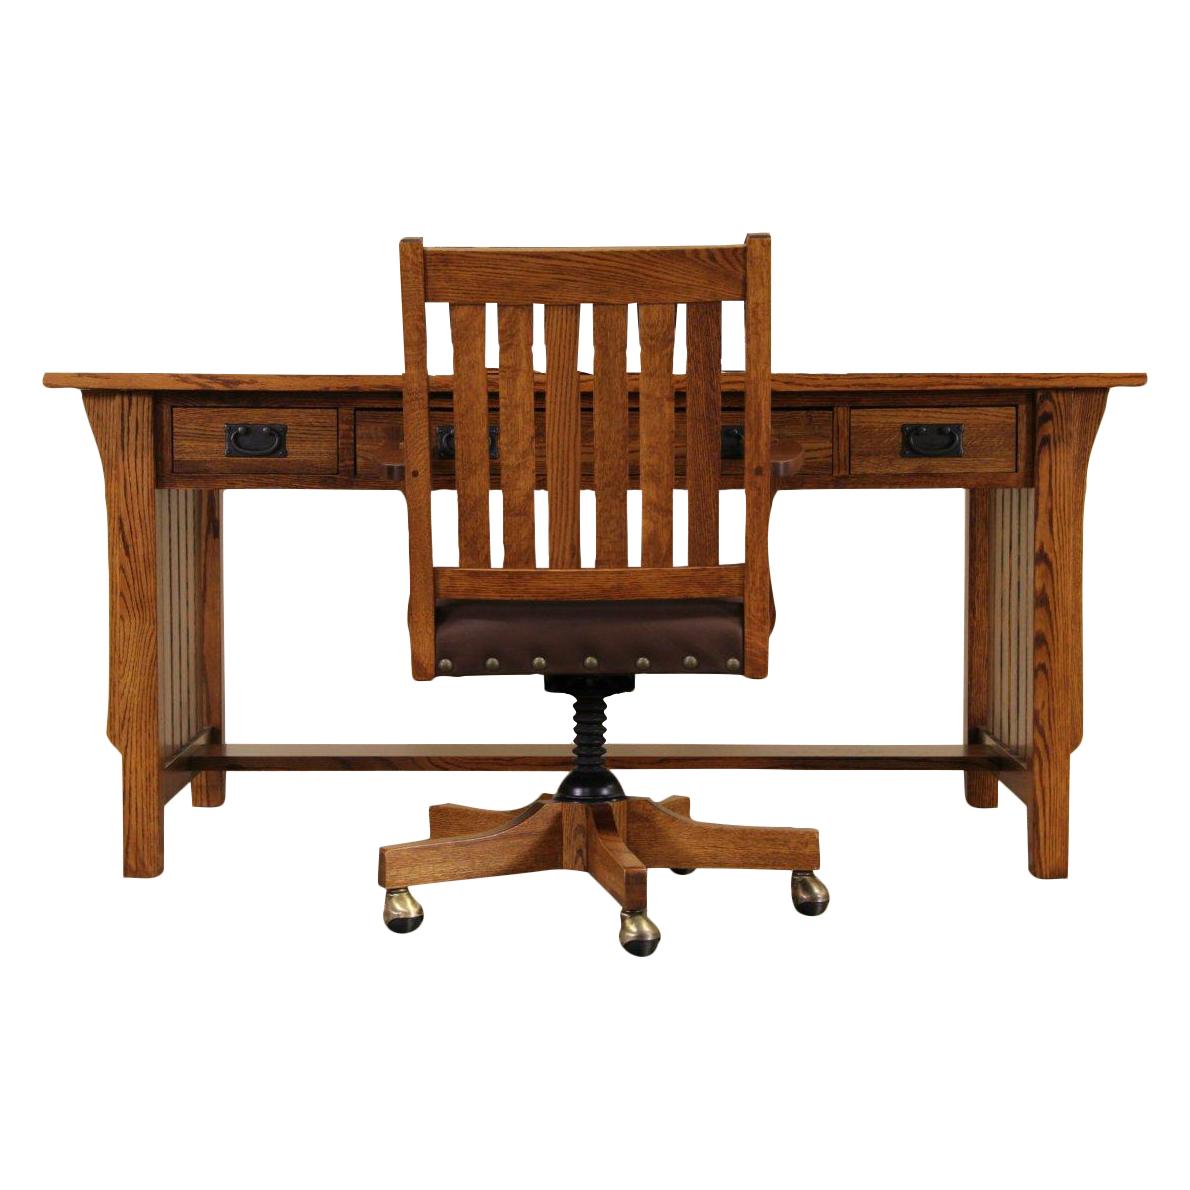 back restoration desks hardware chair best desk pain for of office